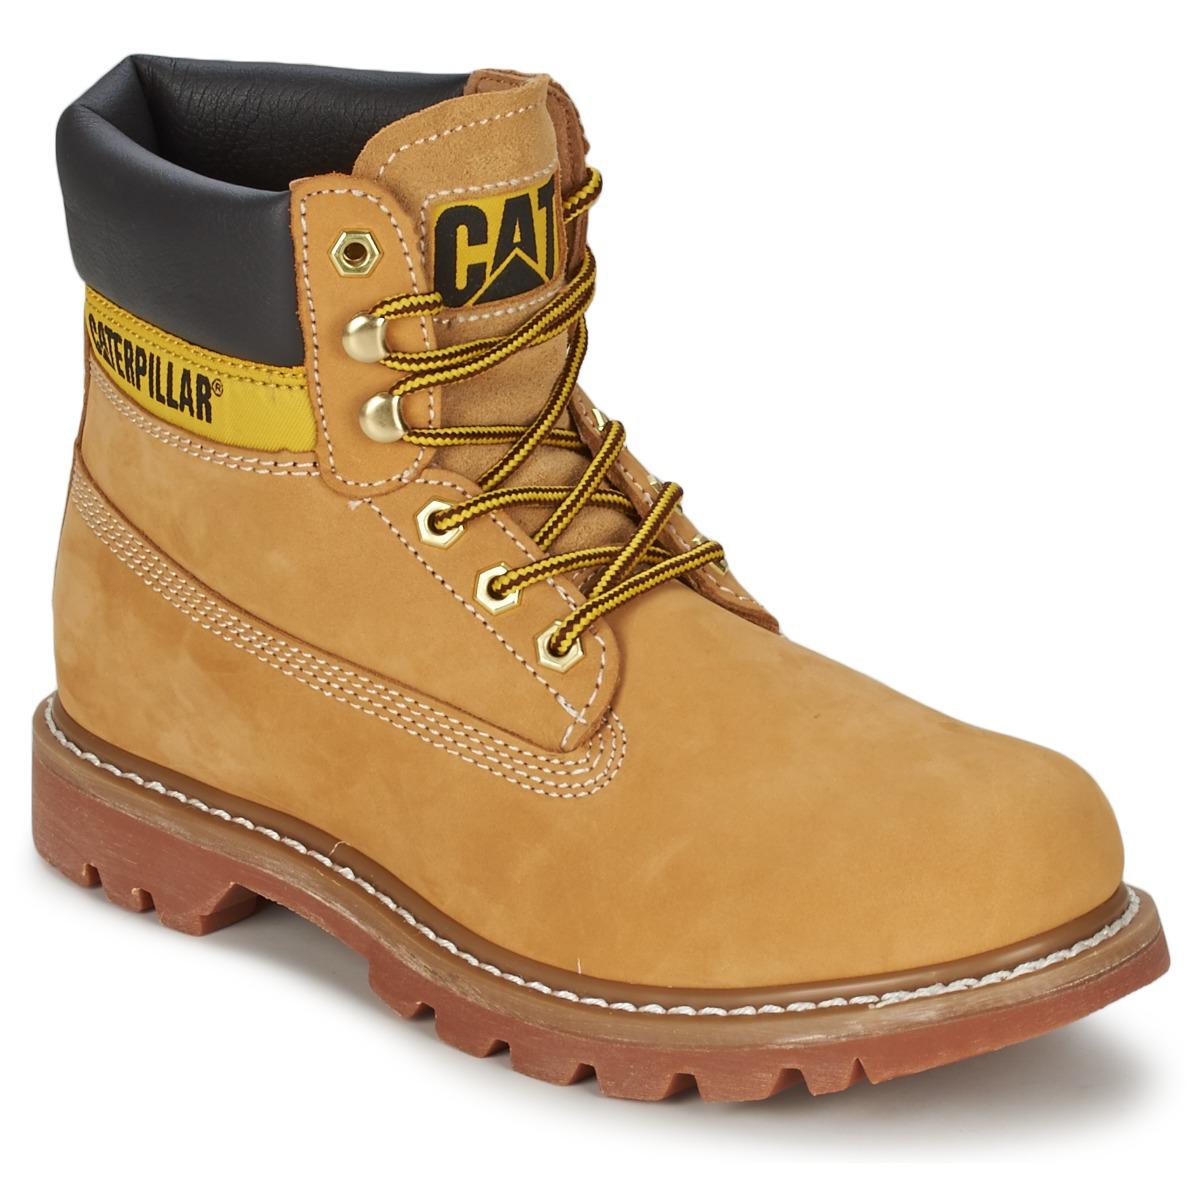 Caterpillar COLORADO Honig - Kostenloser Versand bei Spartoode ! - Schuhe Boots Damen 135,90 €